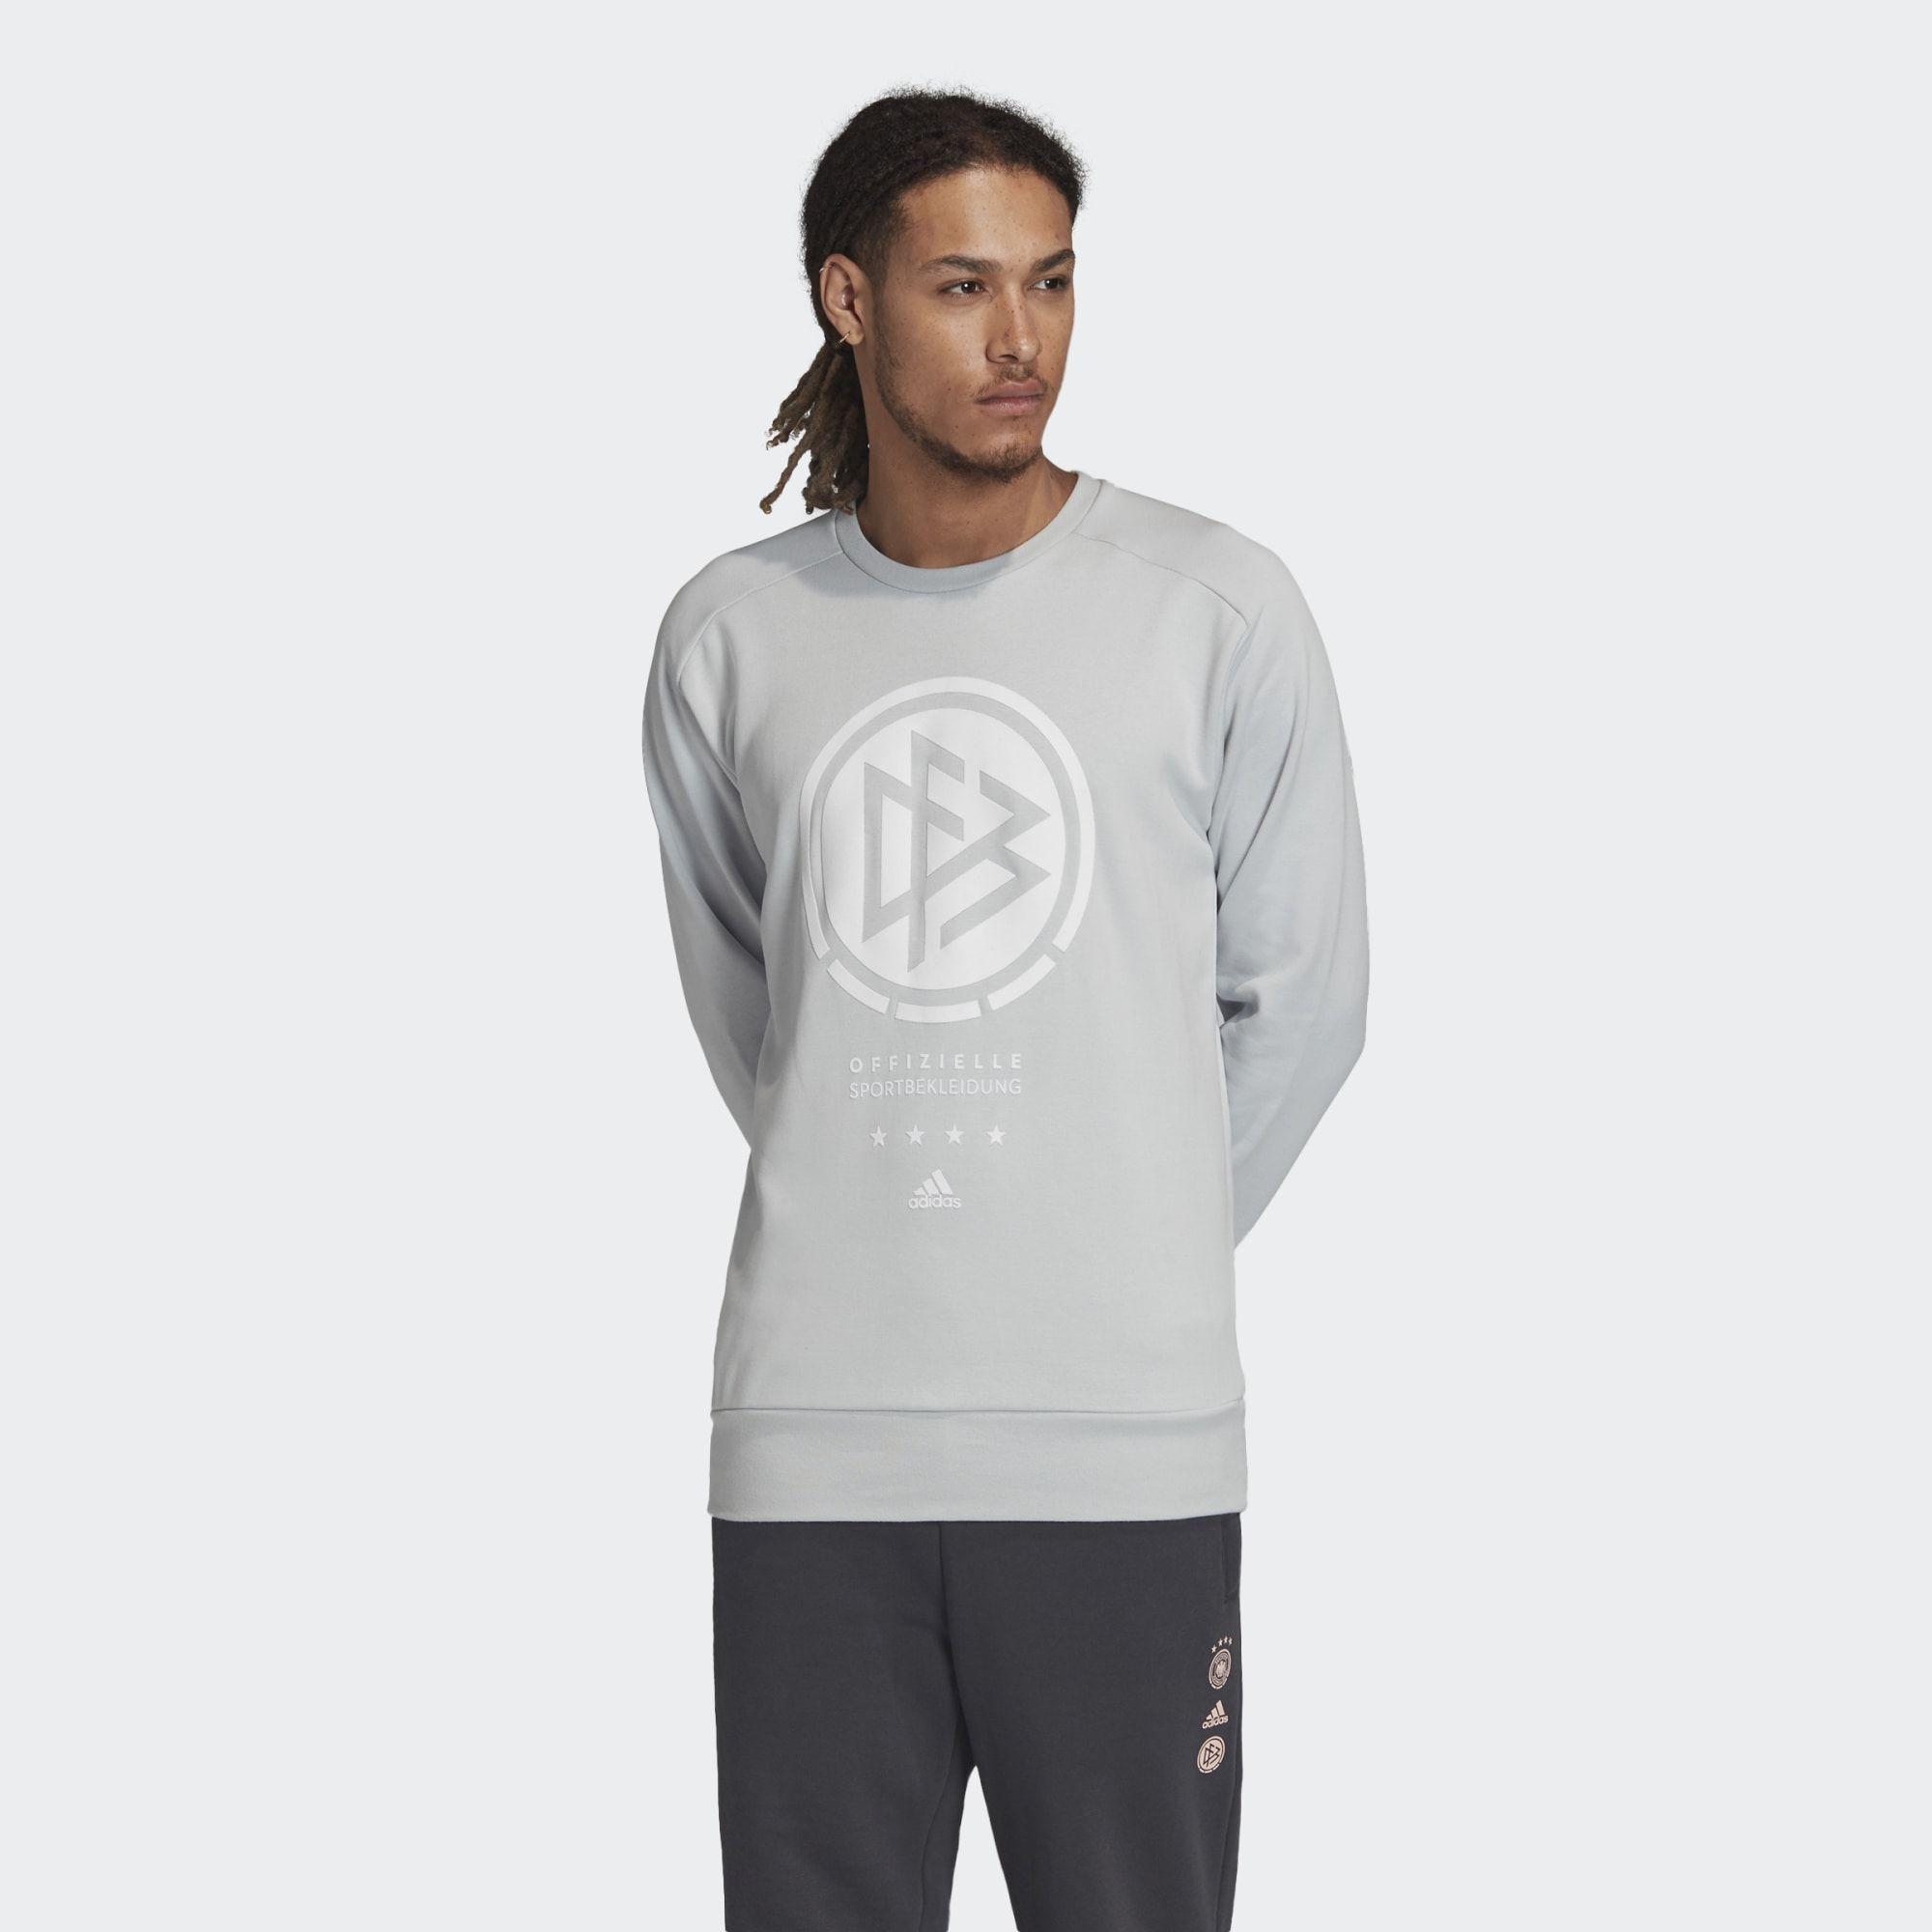 Adidas Germany Seasonal Special Crew Sweatshirt Clear Grey Dfb Adidasfootball Adidas Sweatshirt Sweatshirts Crew Sweatshirts [ 2000 x 2000 Pixel ]